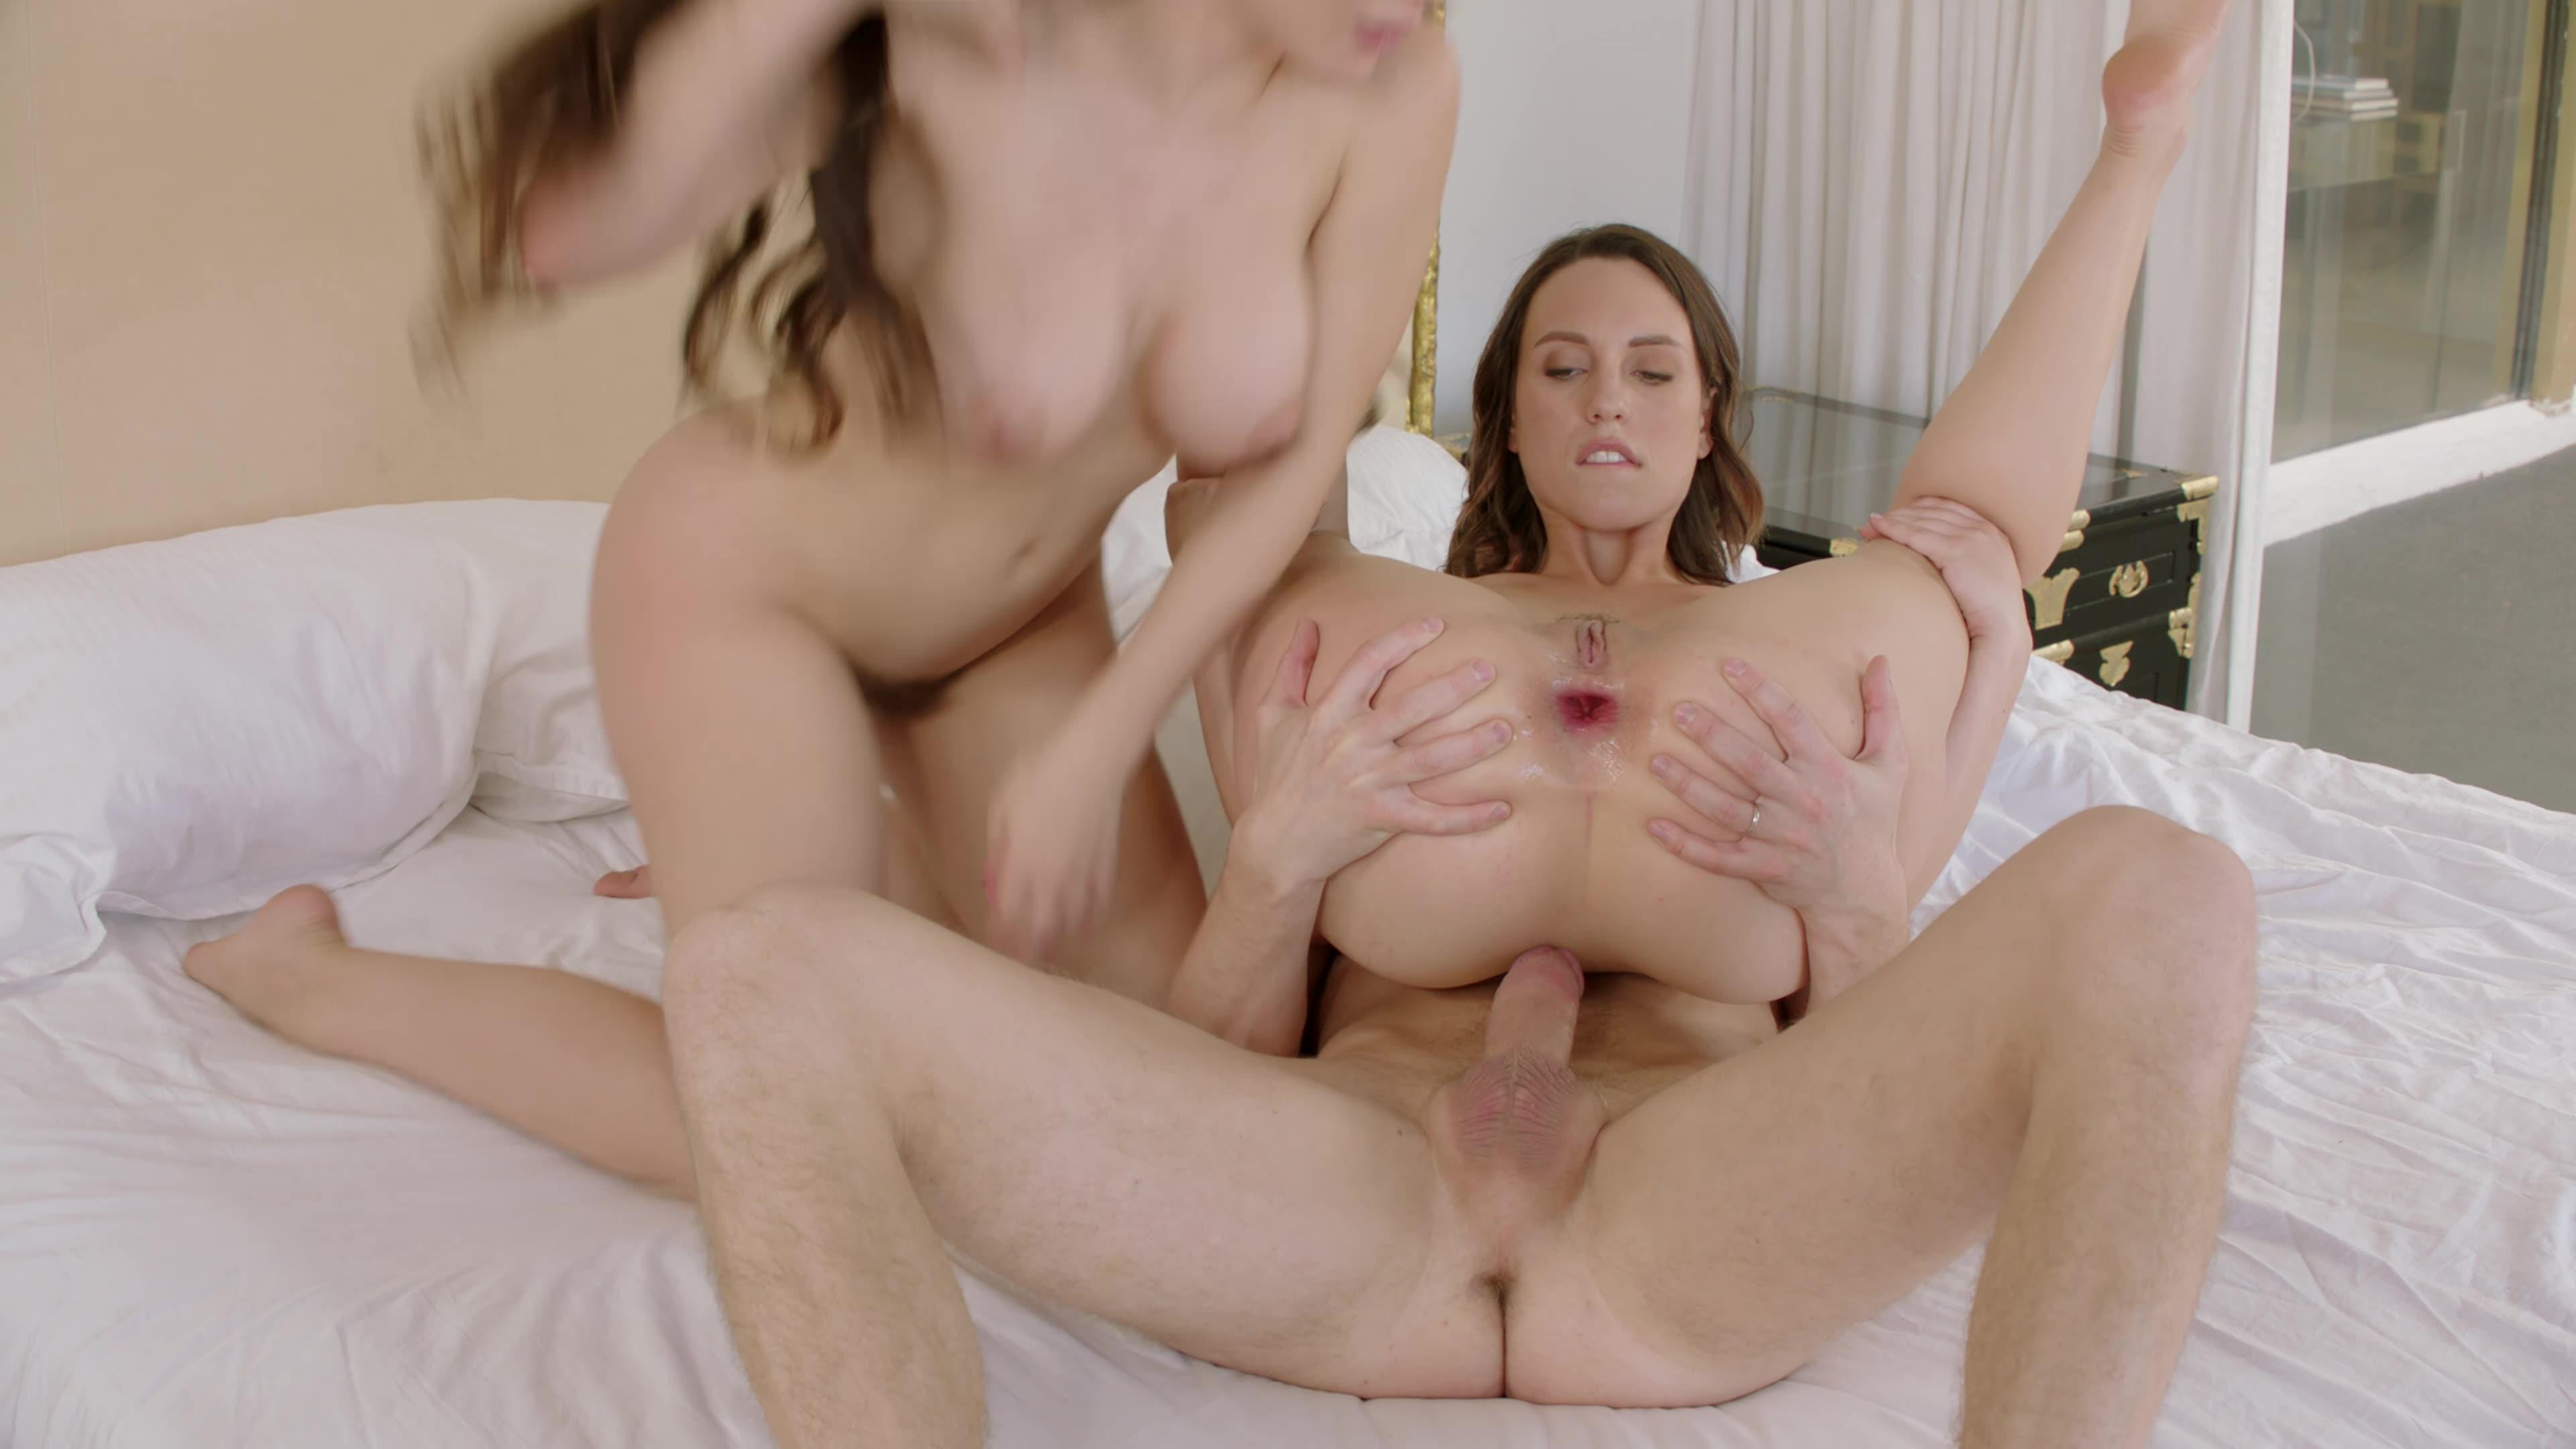 Lana rhoades jade nile threesome